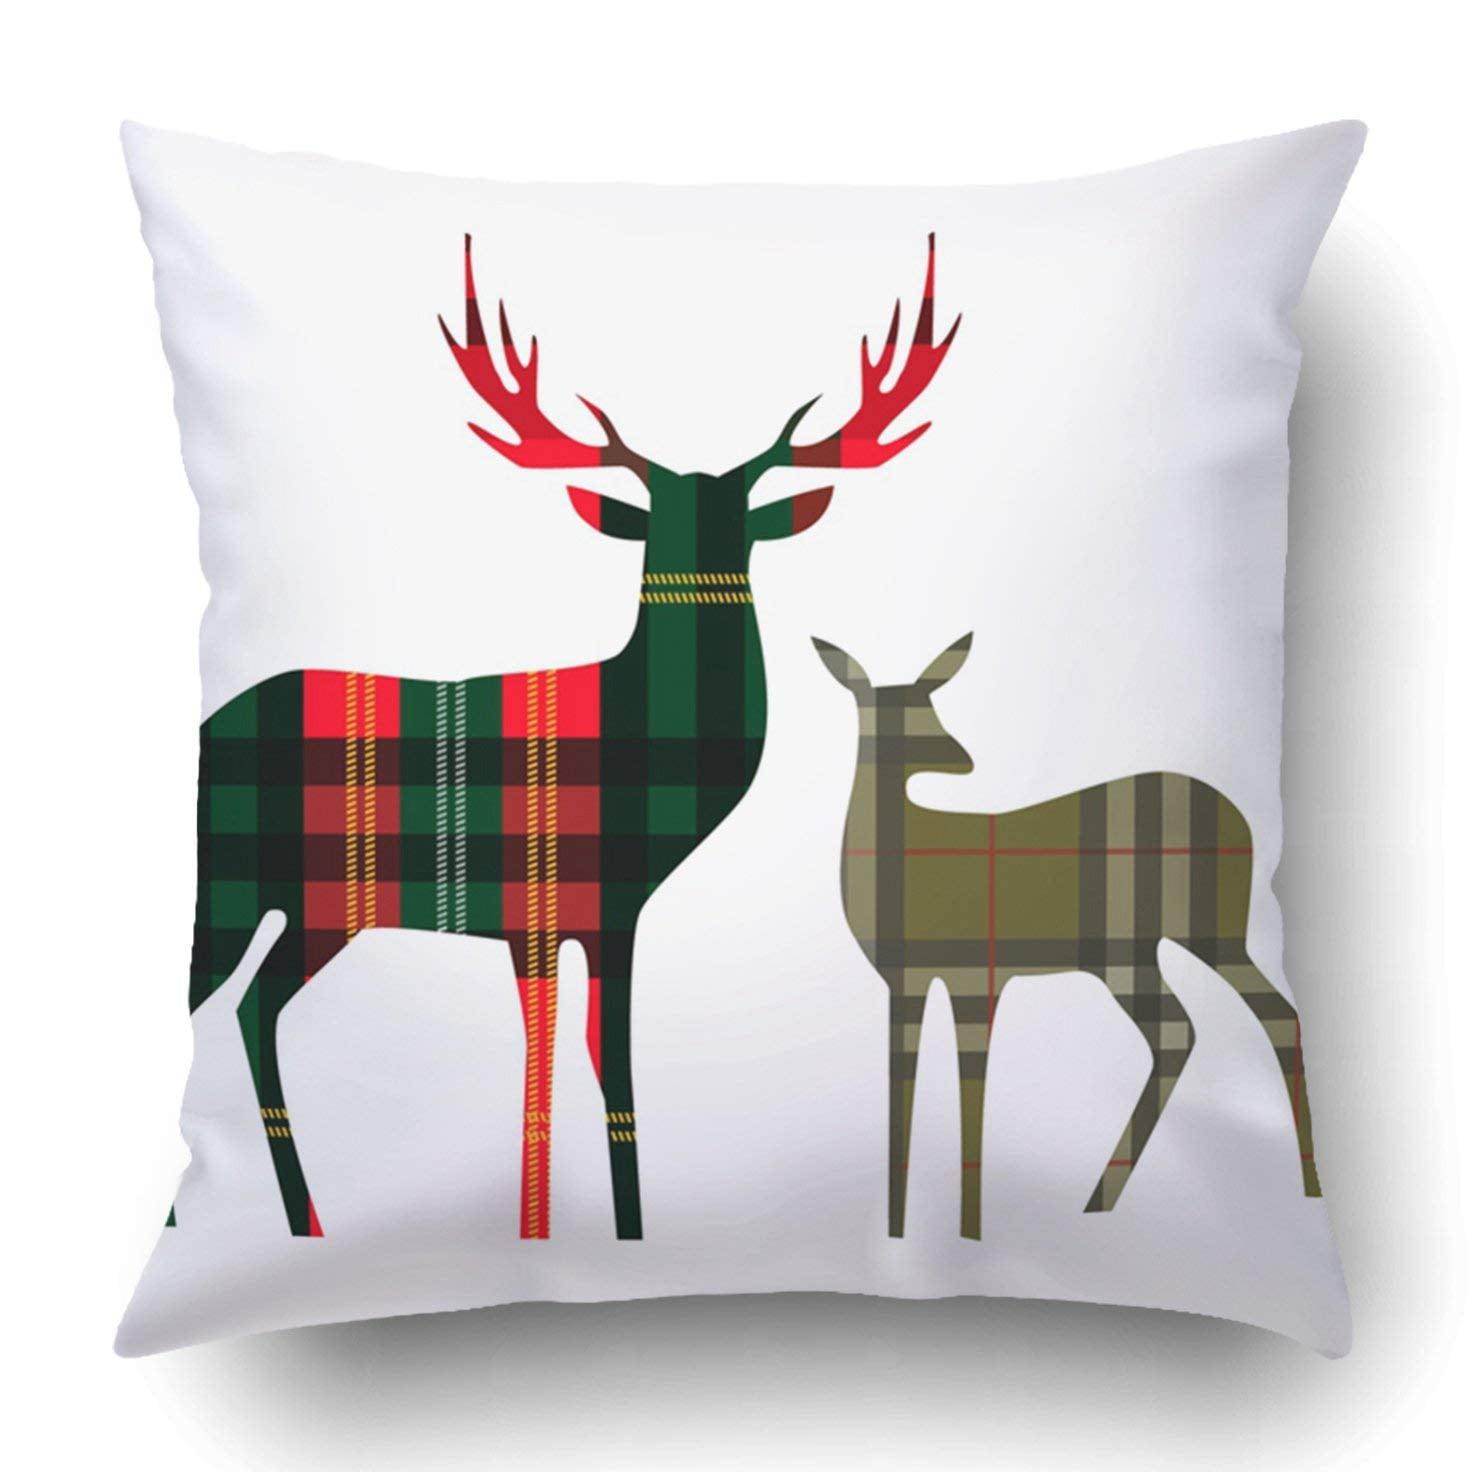 Wopop Green Reindeer Two Deer On Tartan Red Head Abstract Baby Beauty Big Checkered Pillowcase Cover Cushion 18x18 Inch Walmart Com Walmart Com